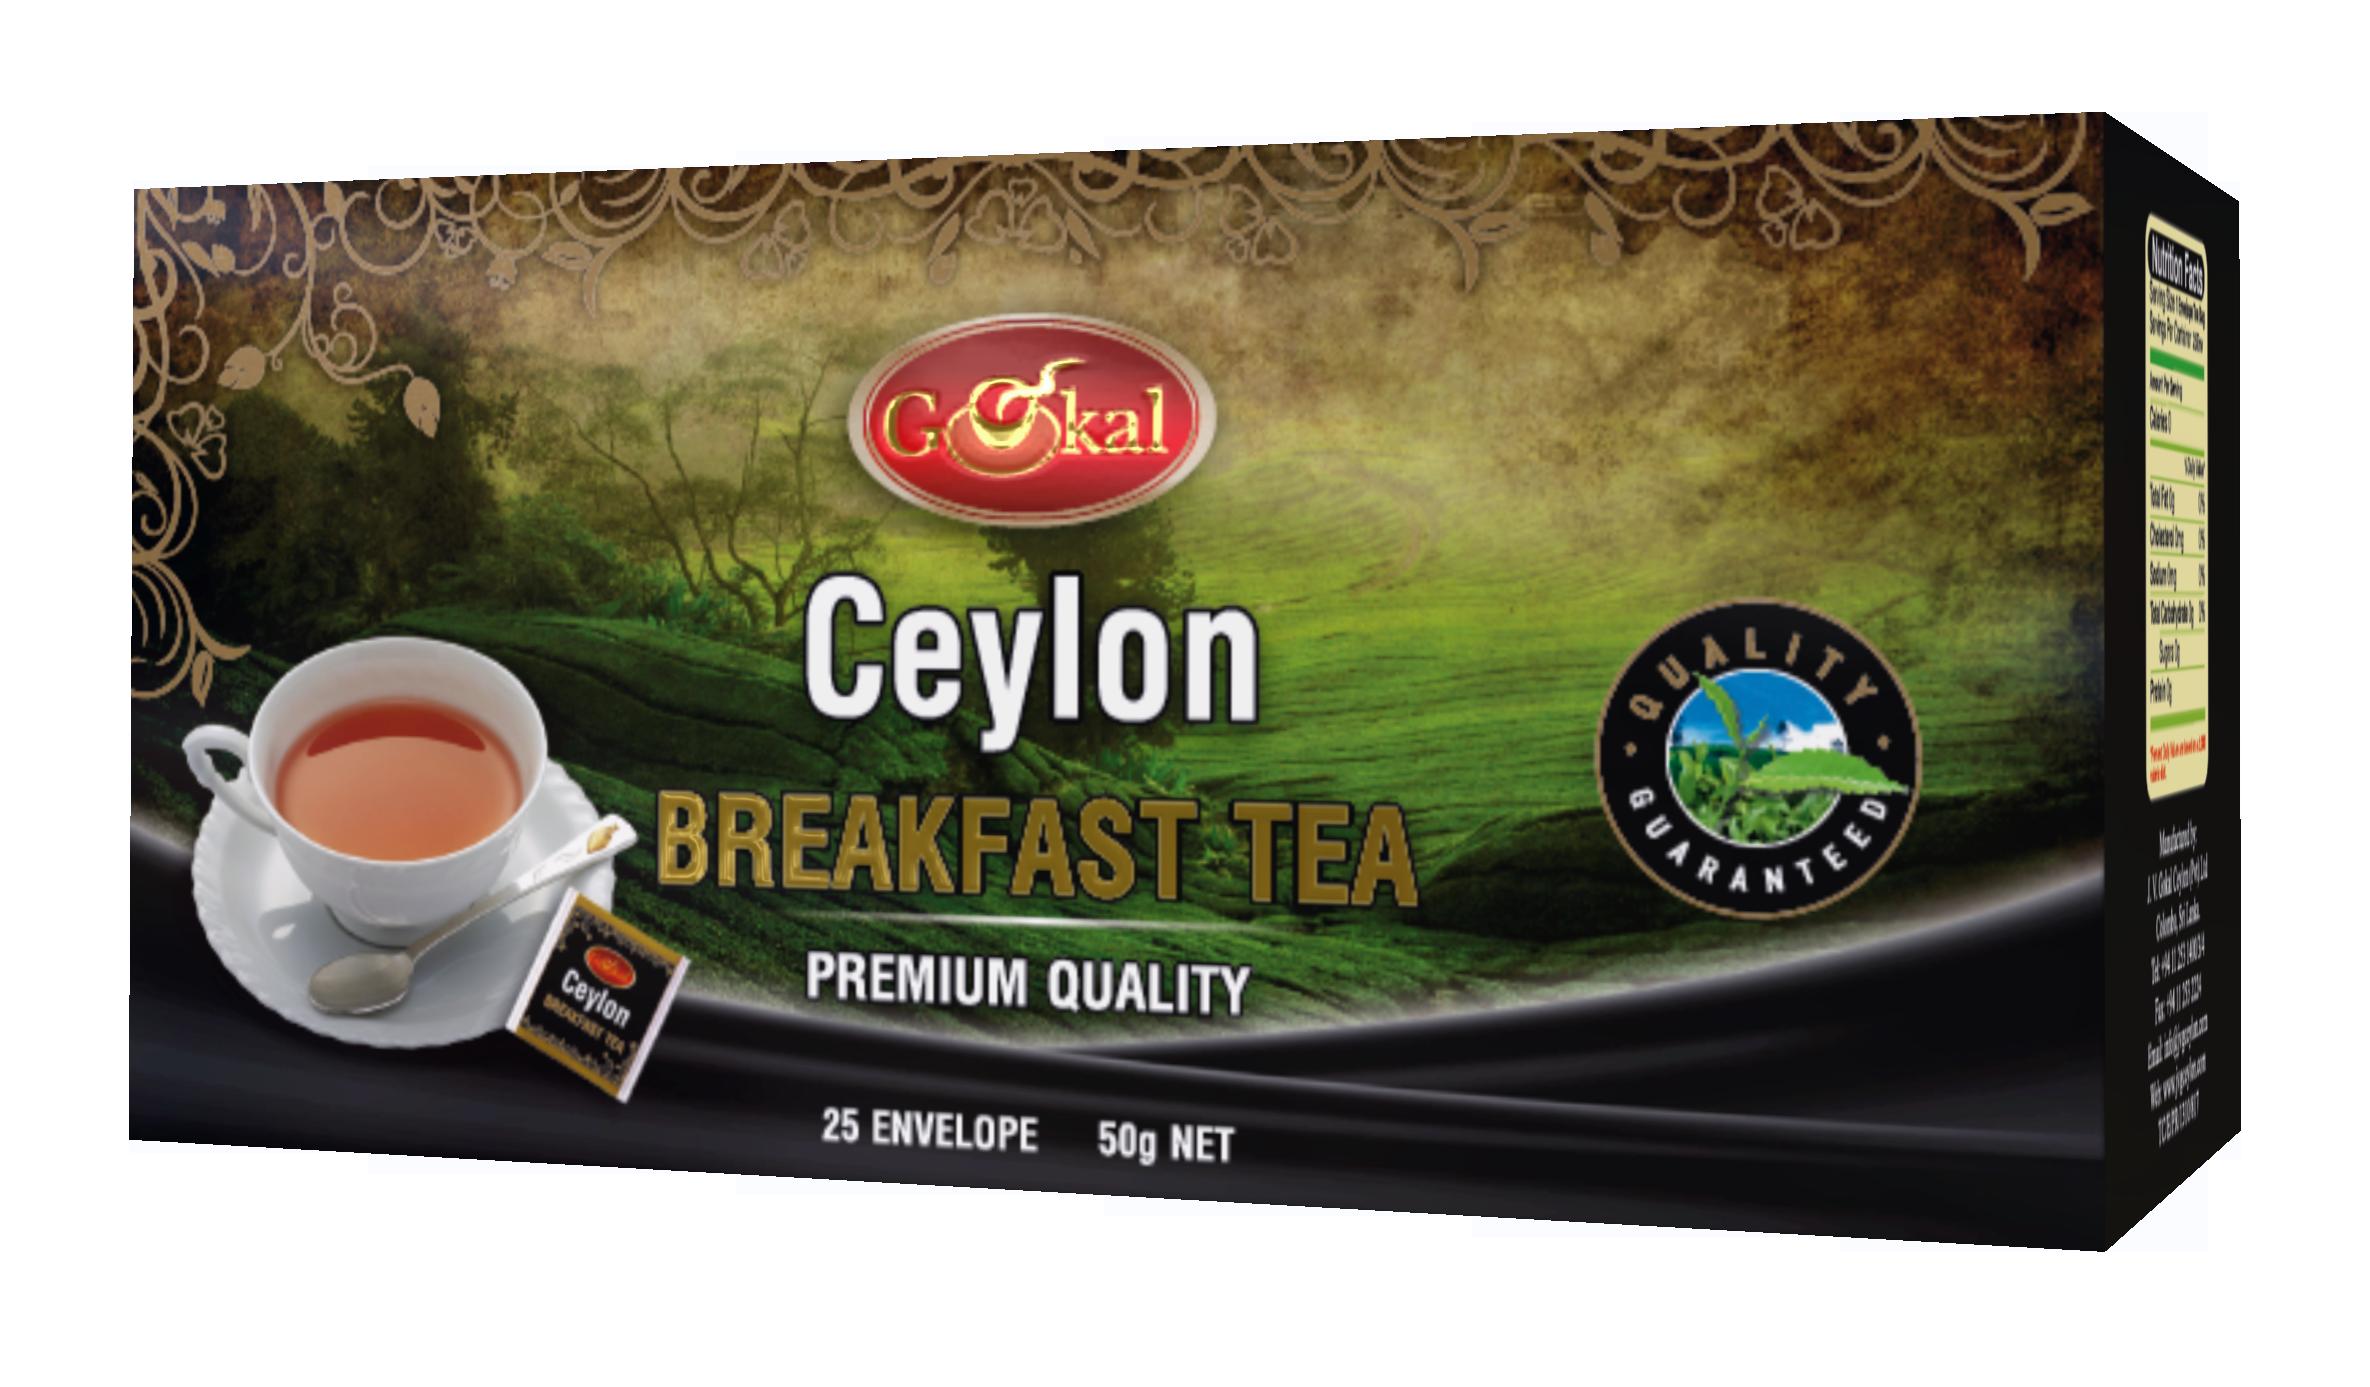 Pin By J V Gokal Ceylon On Pure Ceylon Tea Flavored Tea Breakfast Tea Tea Brands